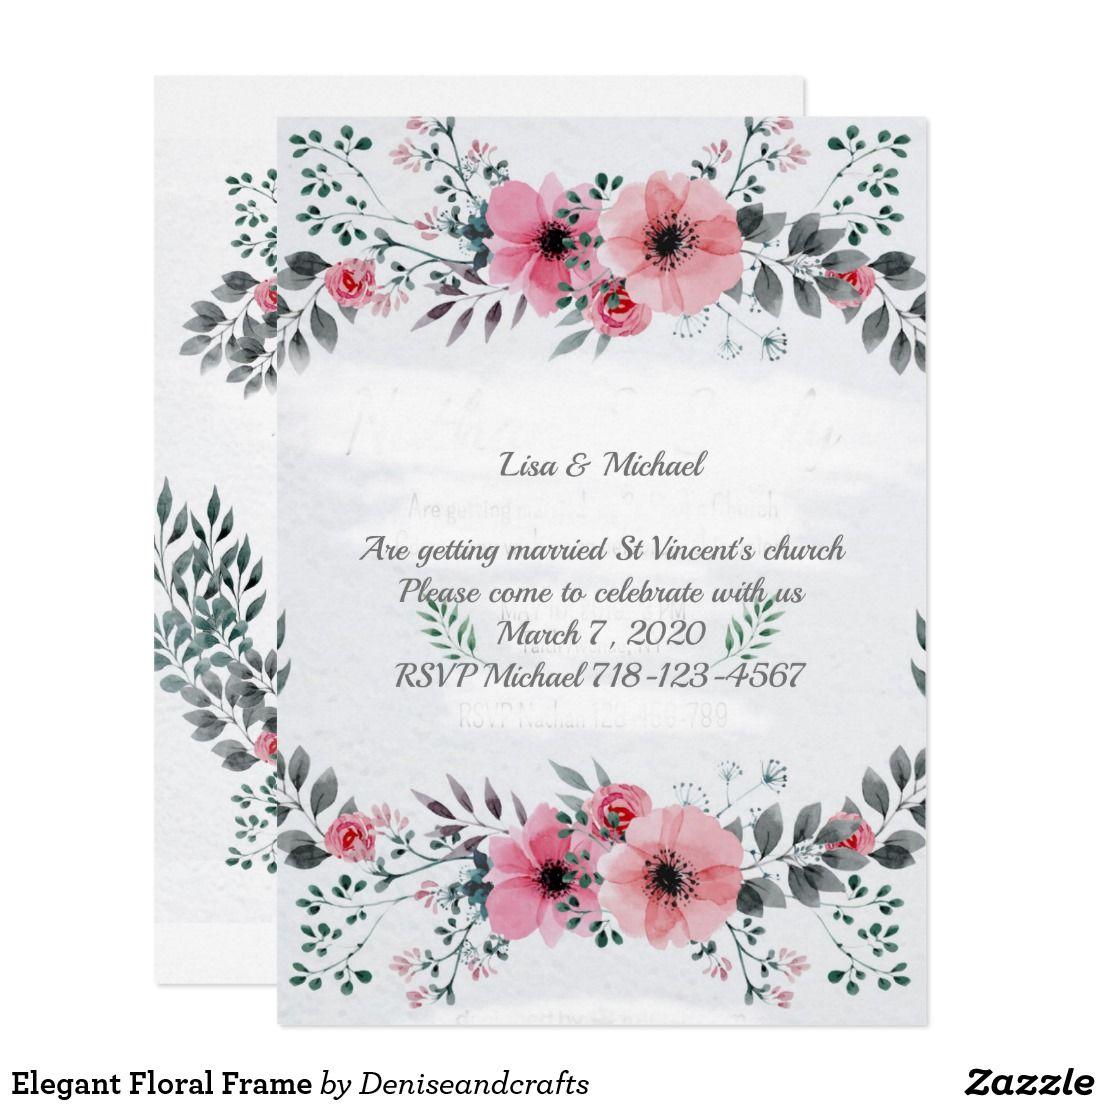 Elegant Floral Frame Invitation Beautiful invitations